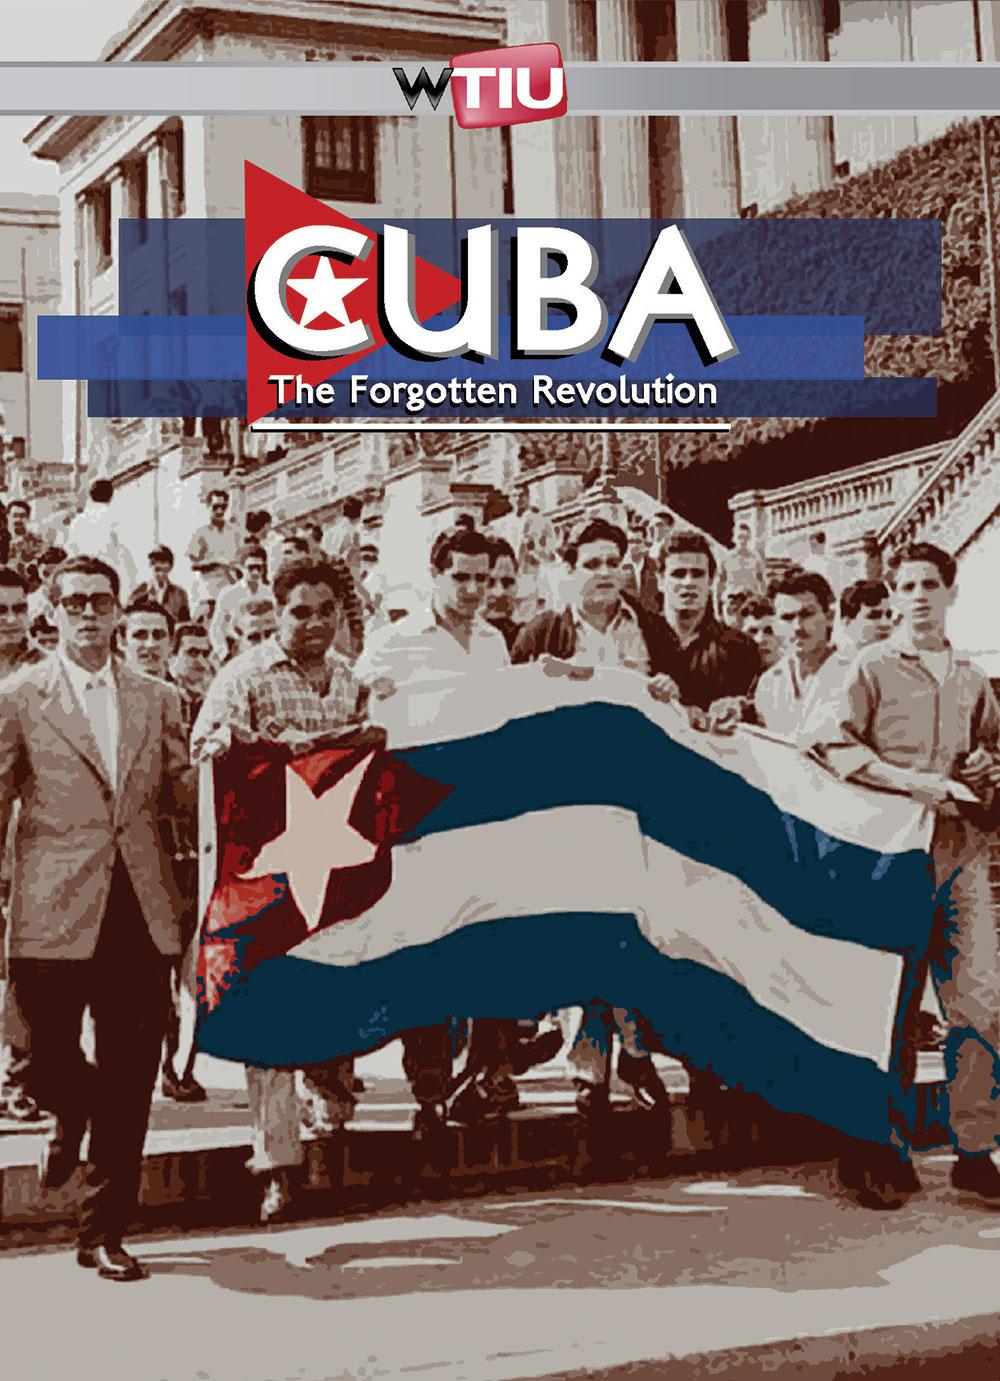 <i>Cuba: The Forgotten Revolution,</i> airs at 9 p.m. Feb. 16 on WTIU.